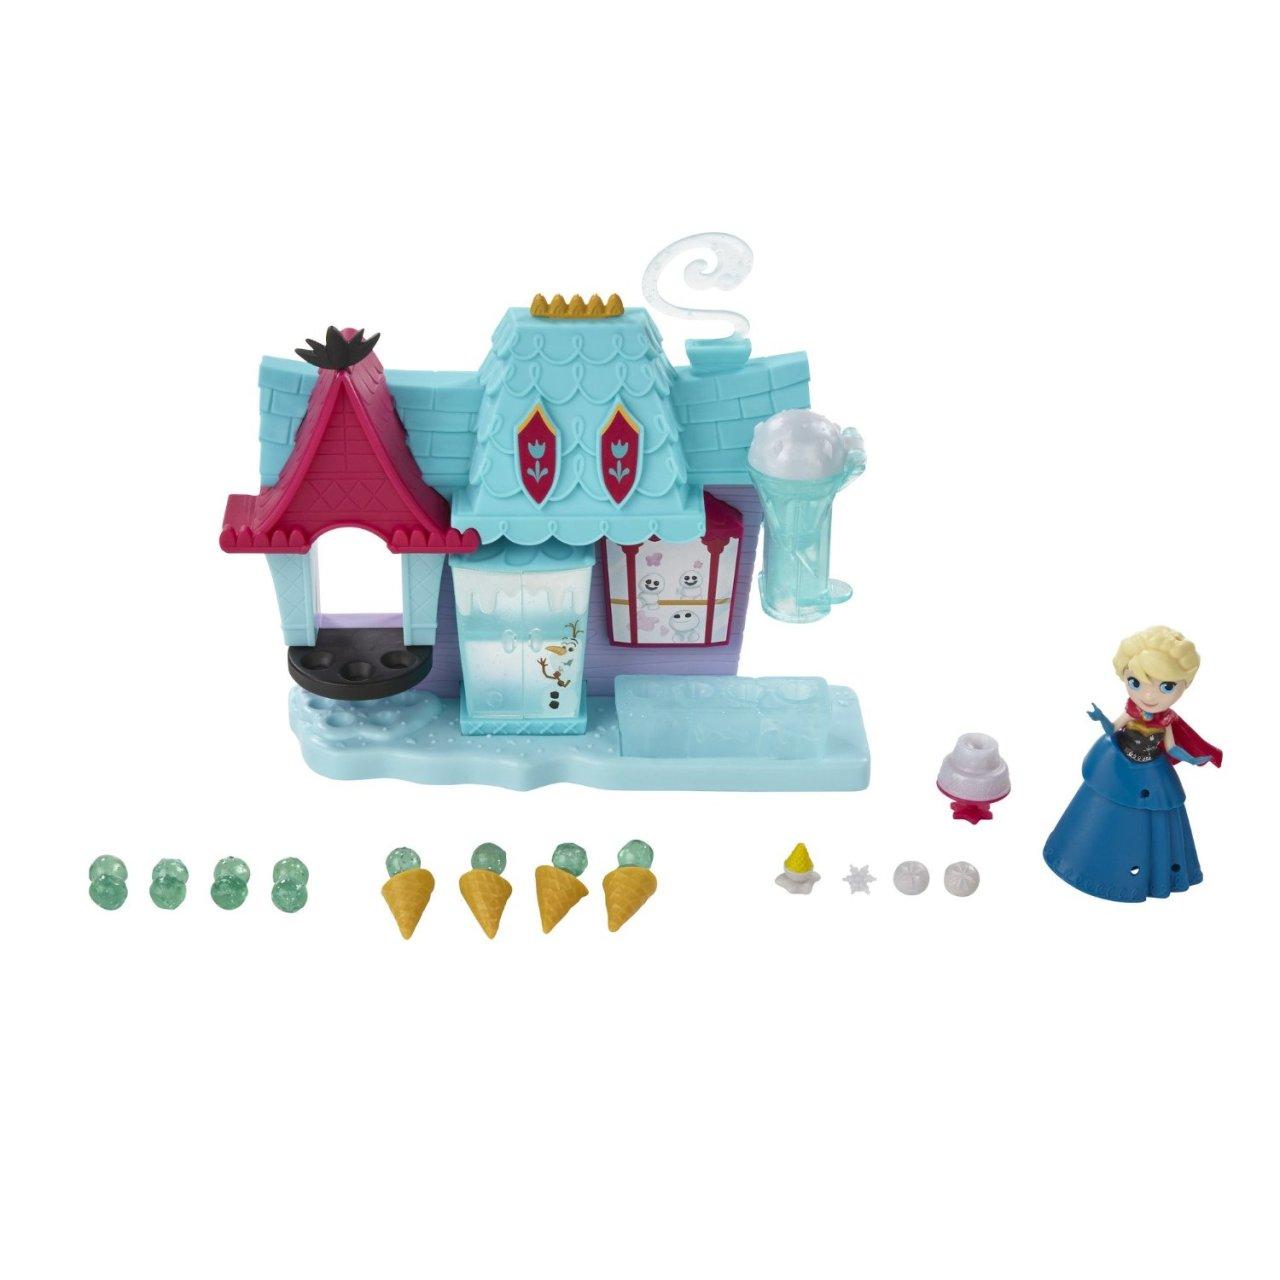 set disney frozen micul regat - casuta cu inghetata a elsei din arendelle